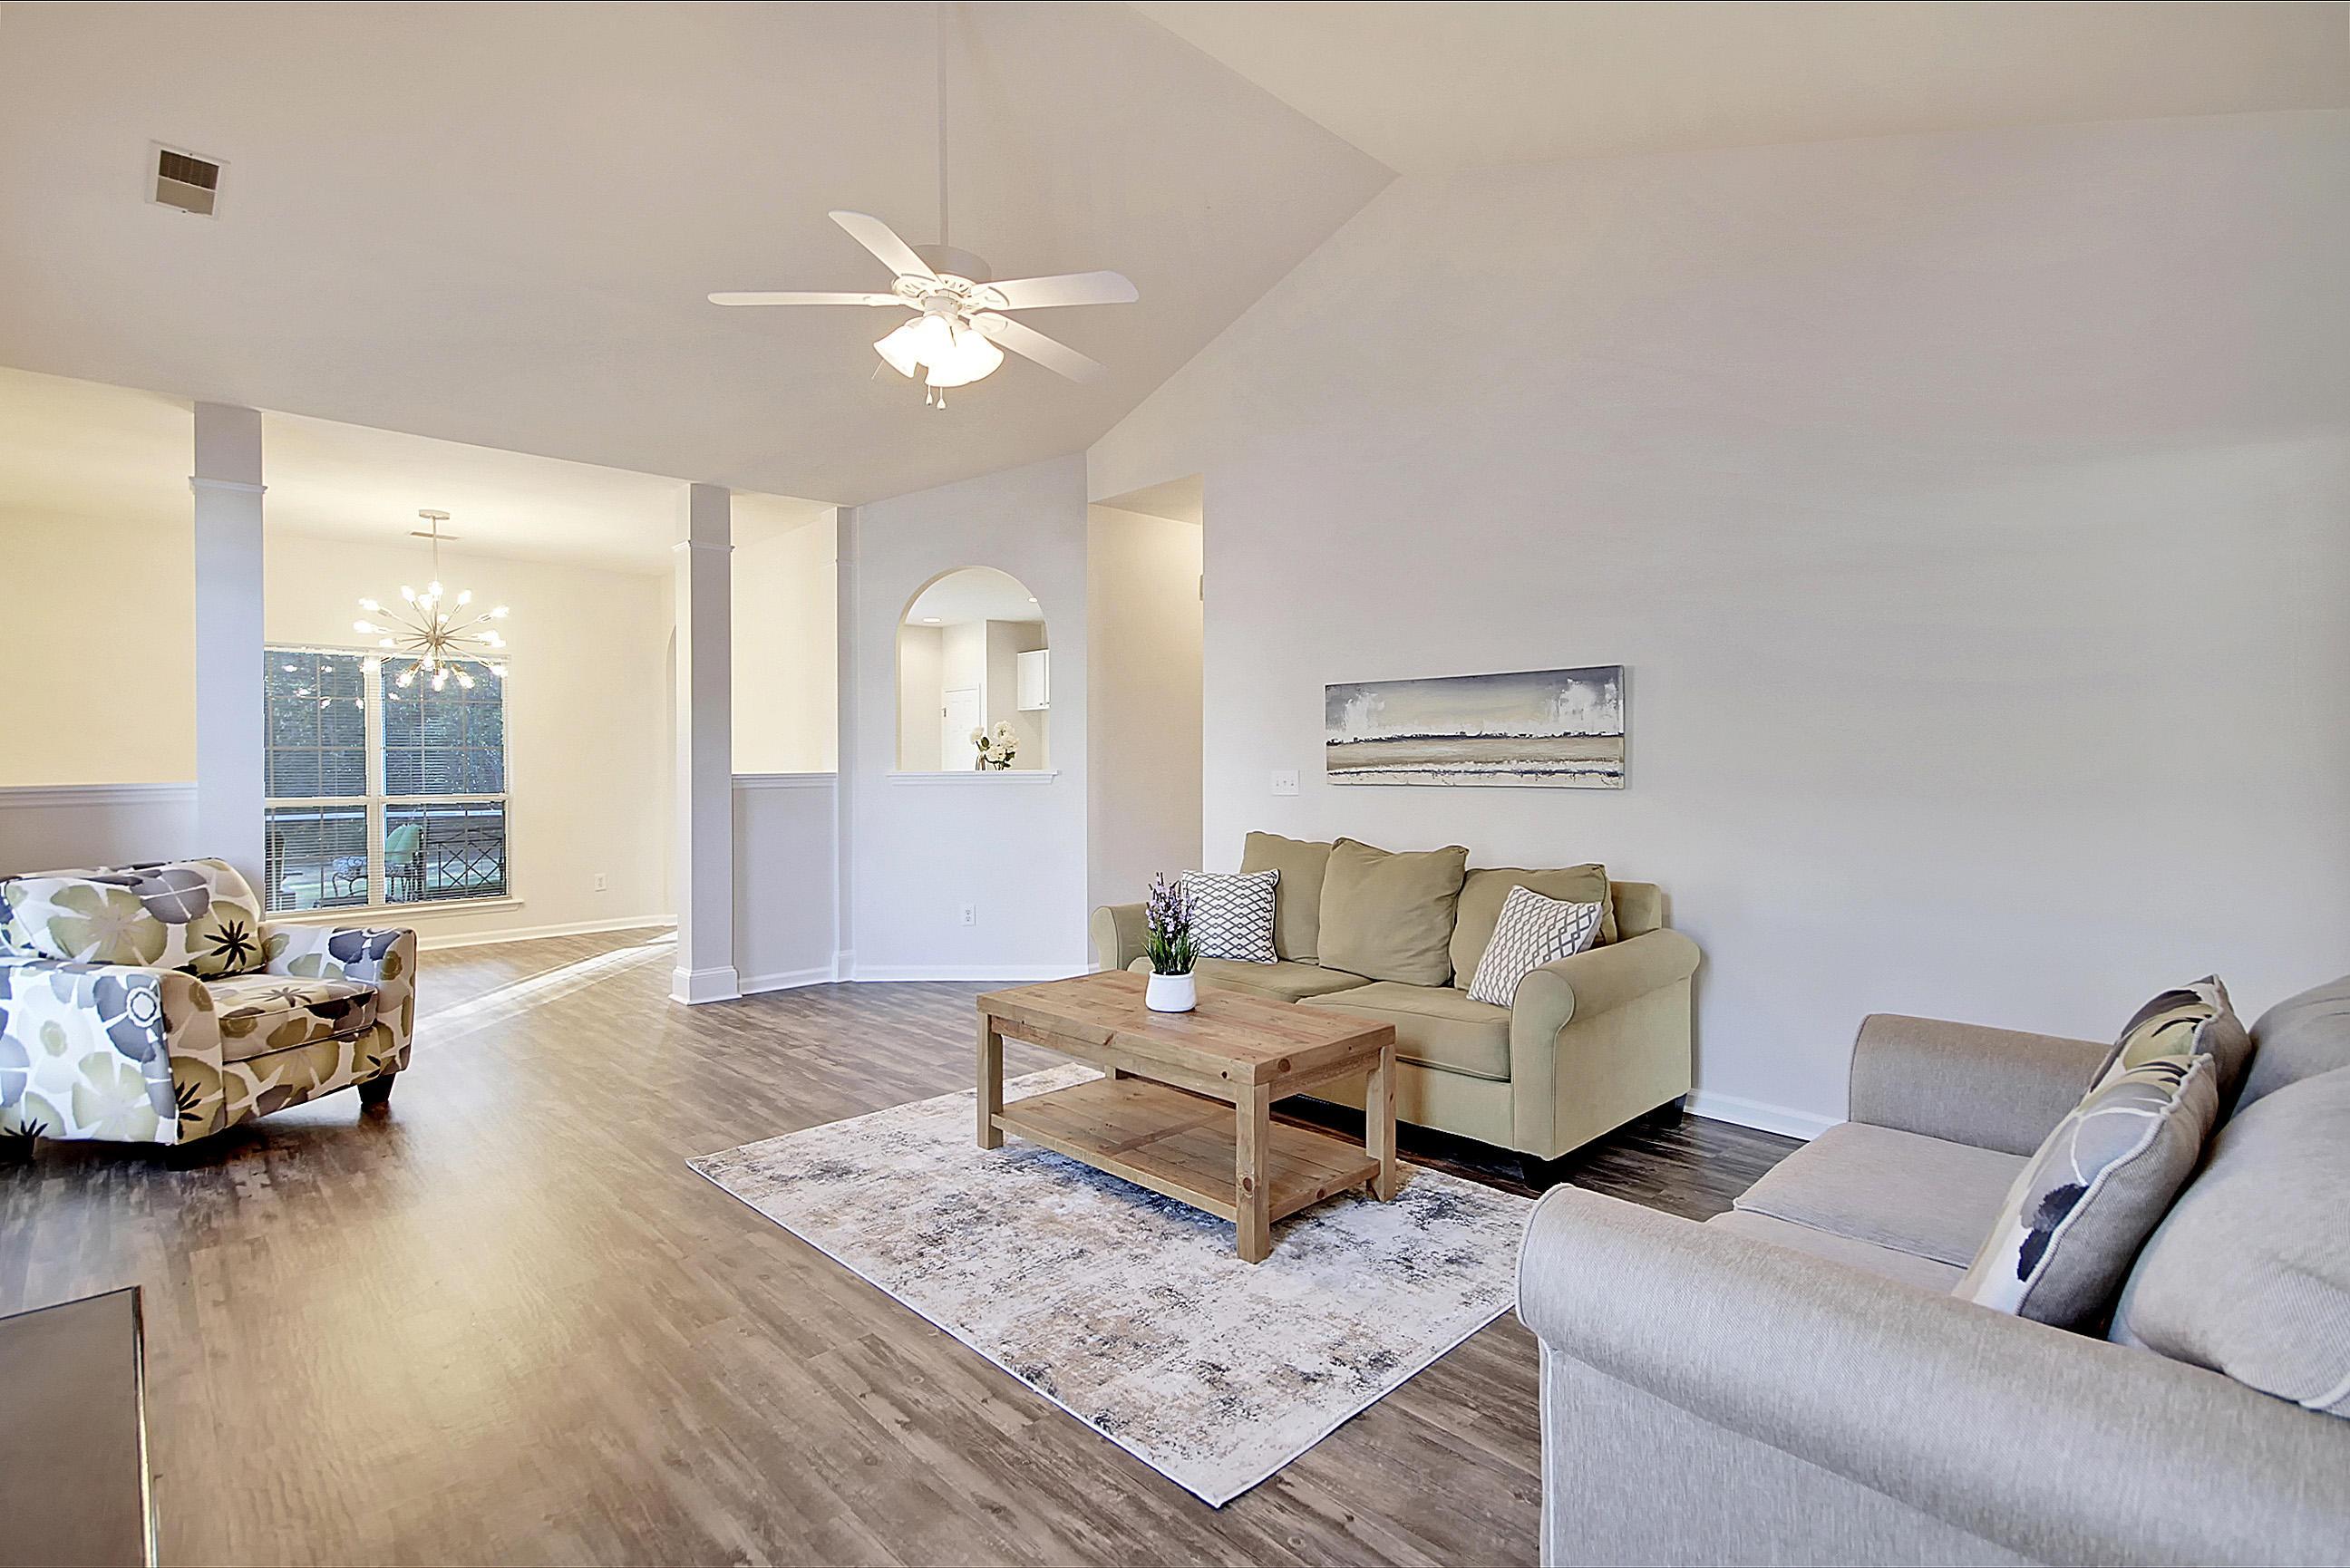 Dunes West Homes For Sale - 2656 Palmetto Hall, Mount Pleasant, SC - 8